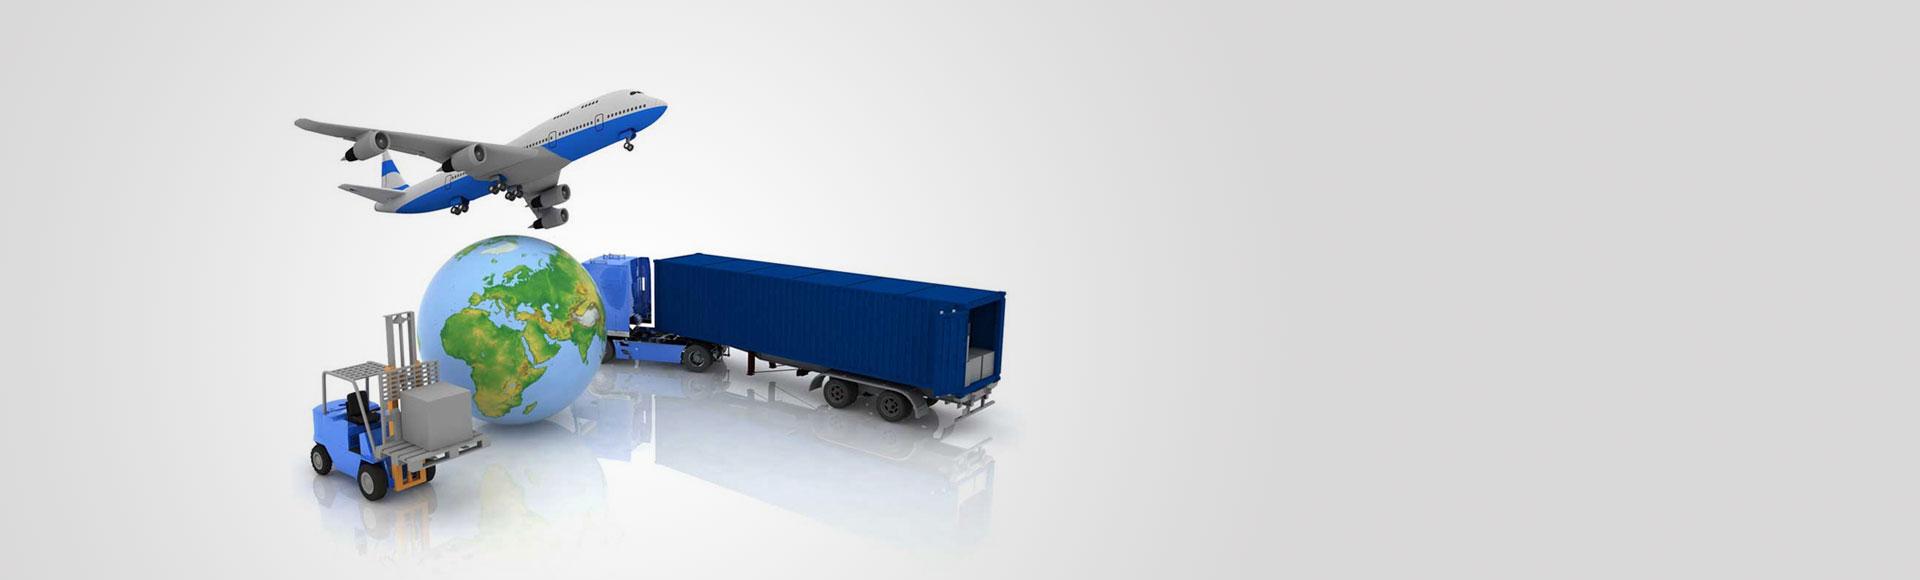 Aadhunic Cargo Carriers